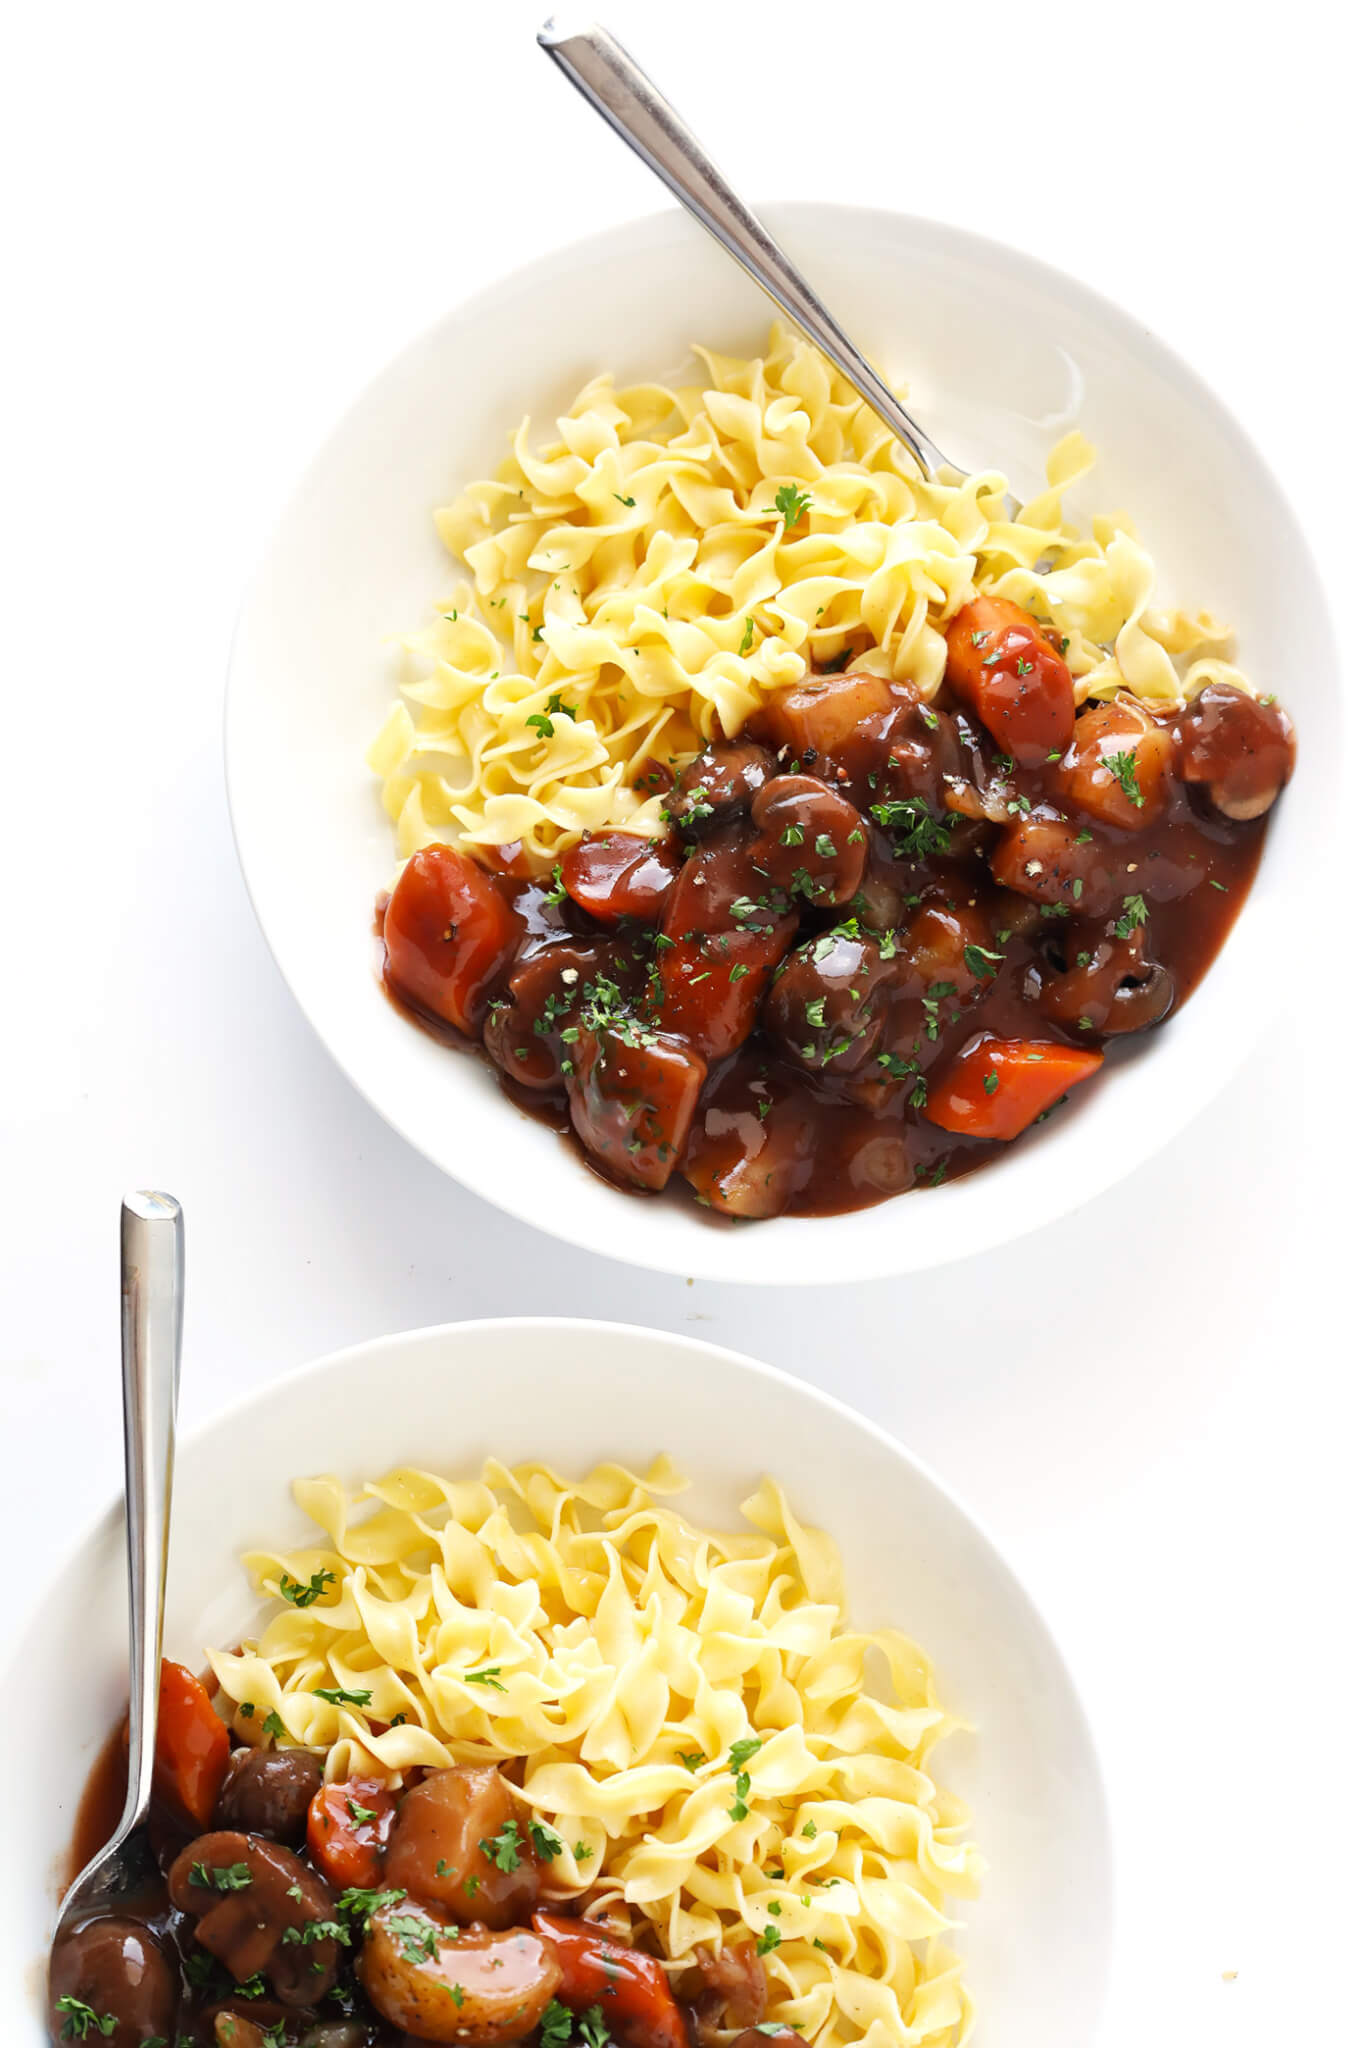 Vegetarian Portobello Pot Roast Recipe with noodles